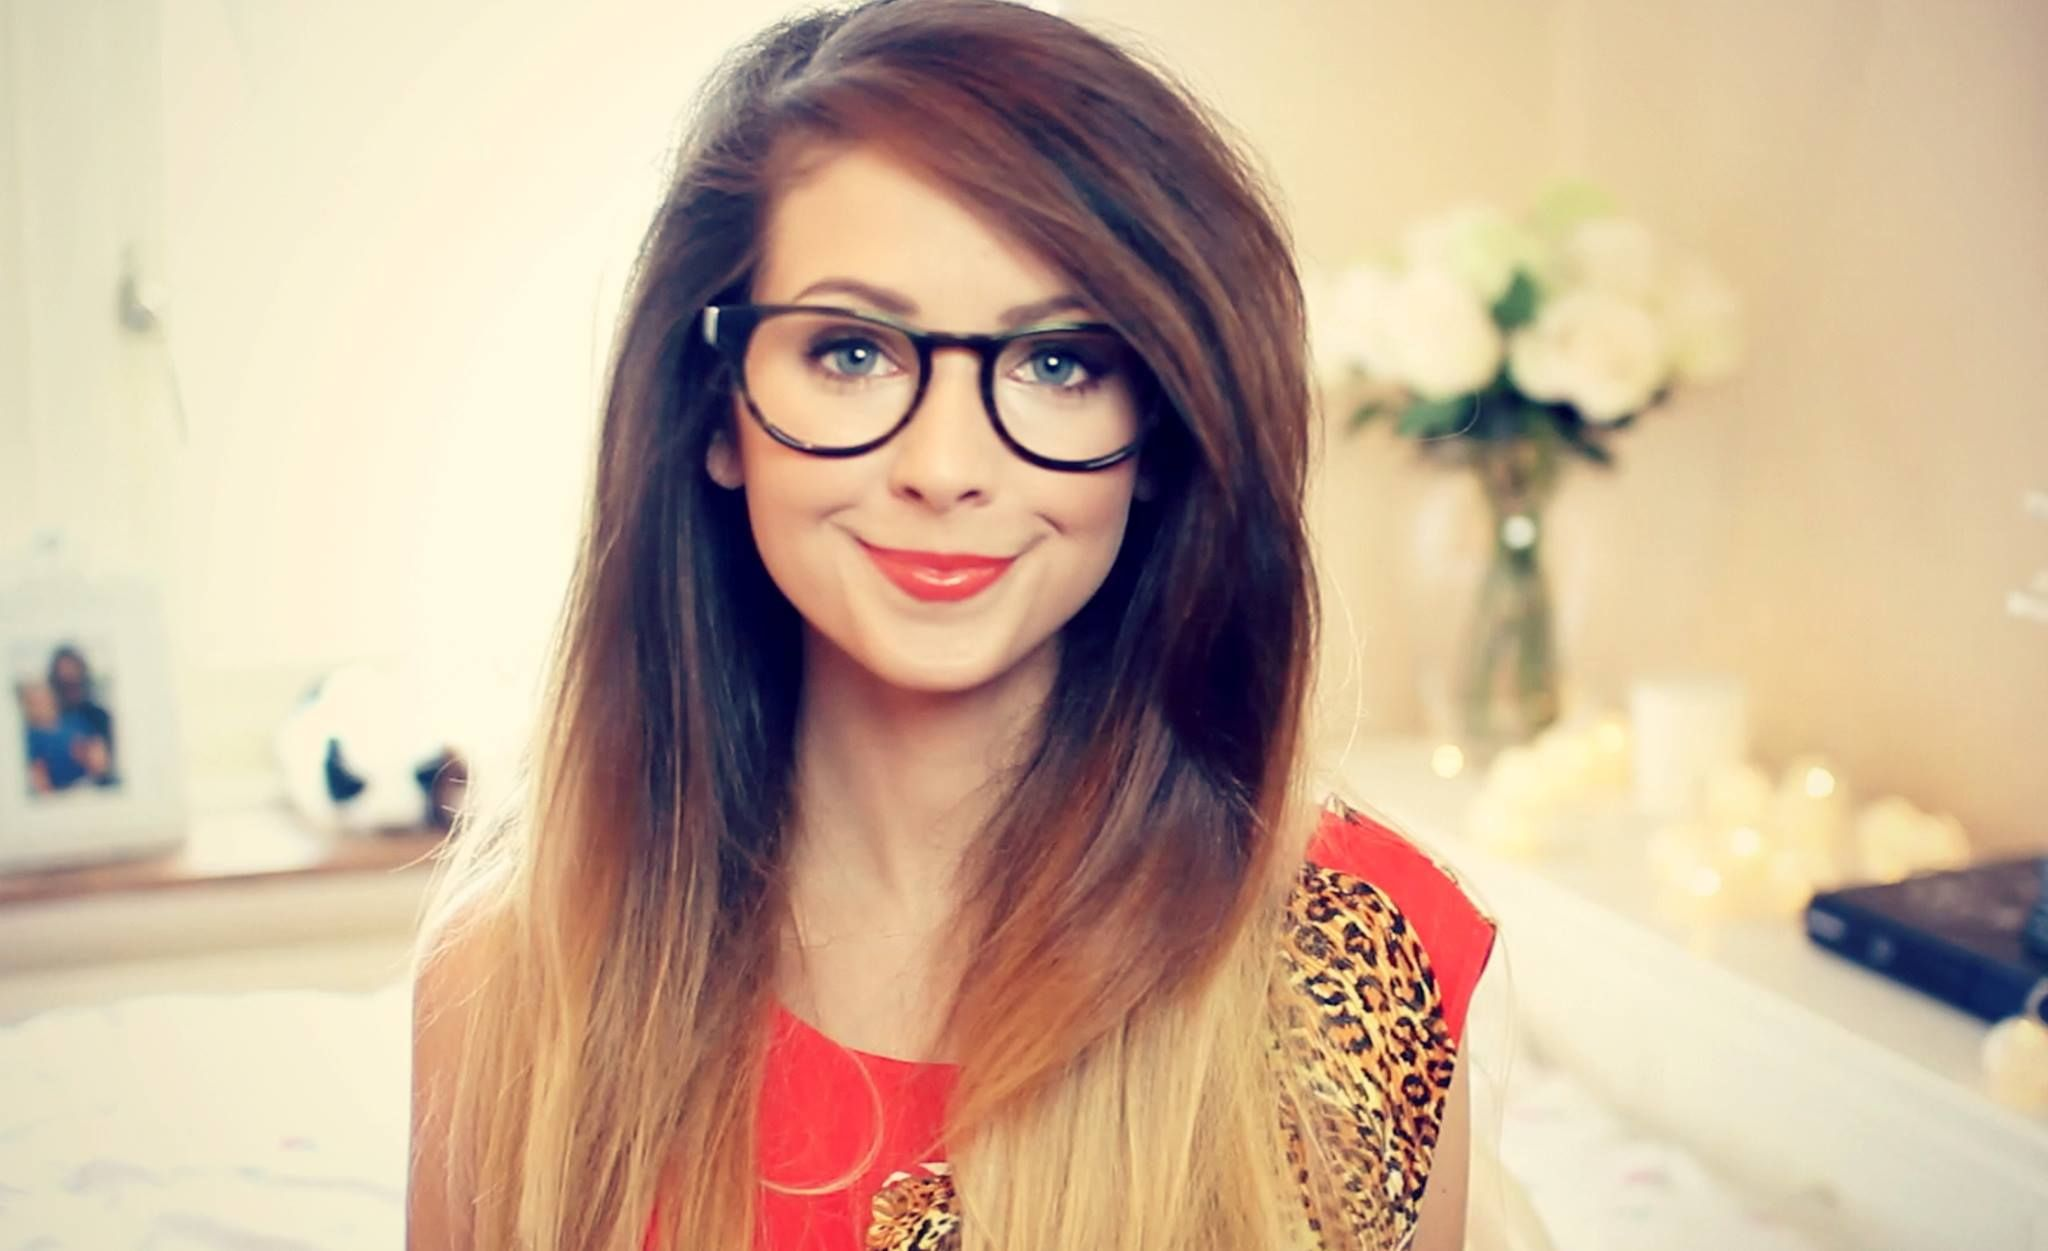 Images For Zoella Instagram Zoella Beauty Zoella Hair Hair Styles